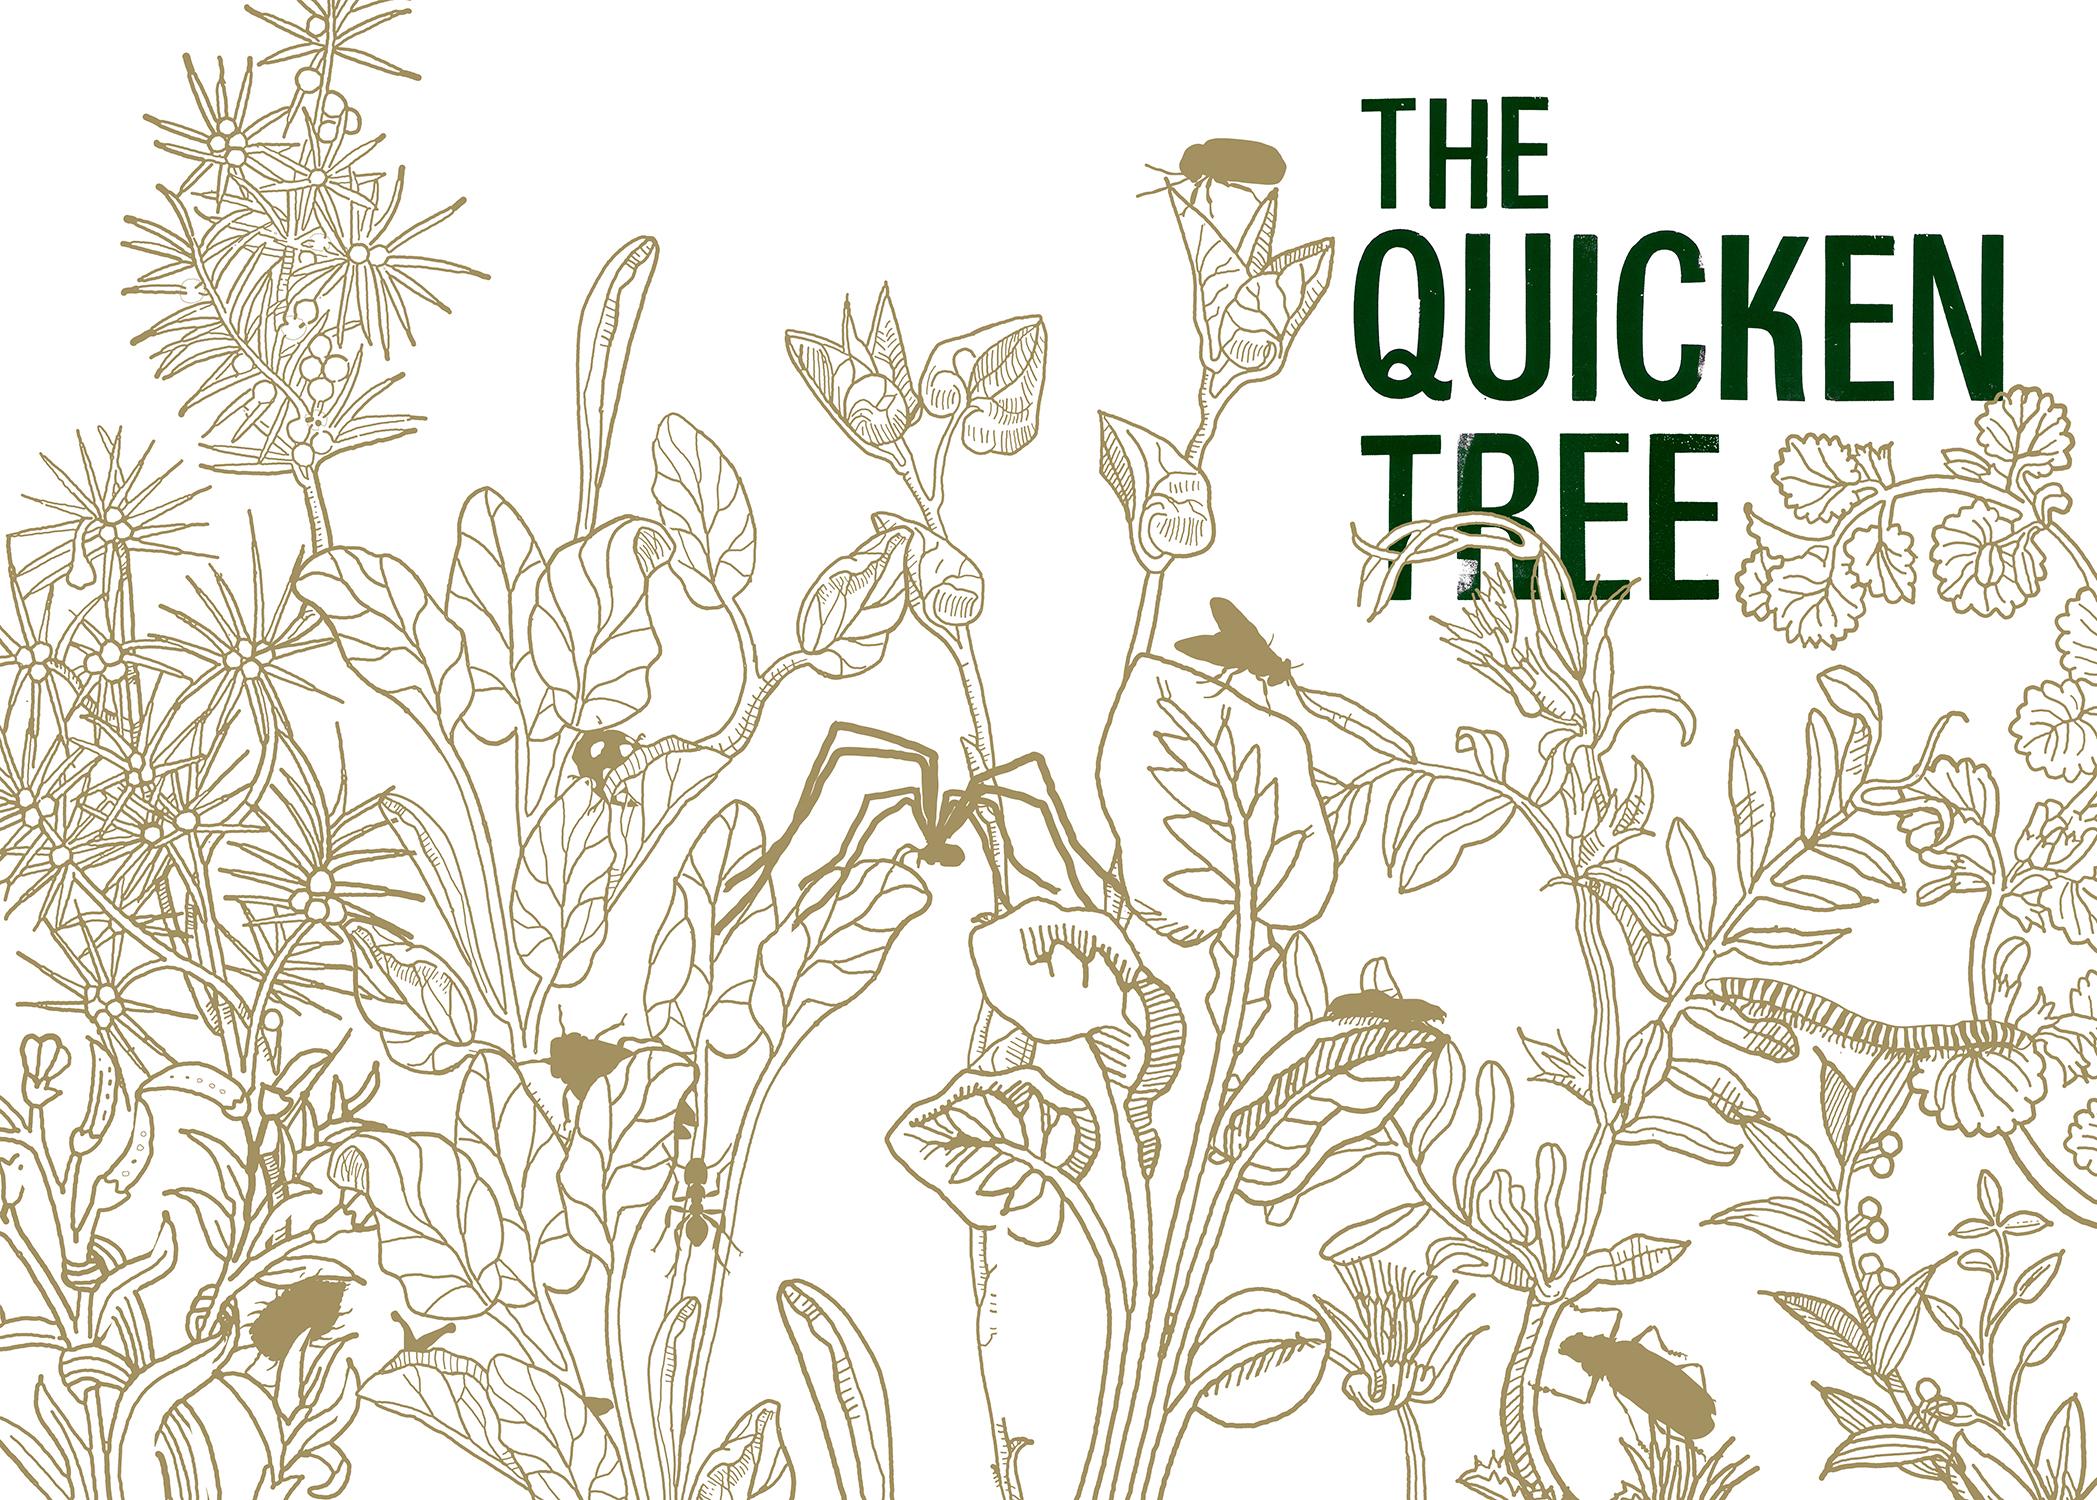 The Quicken Tree